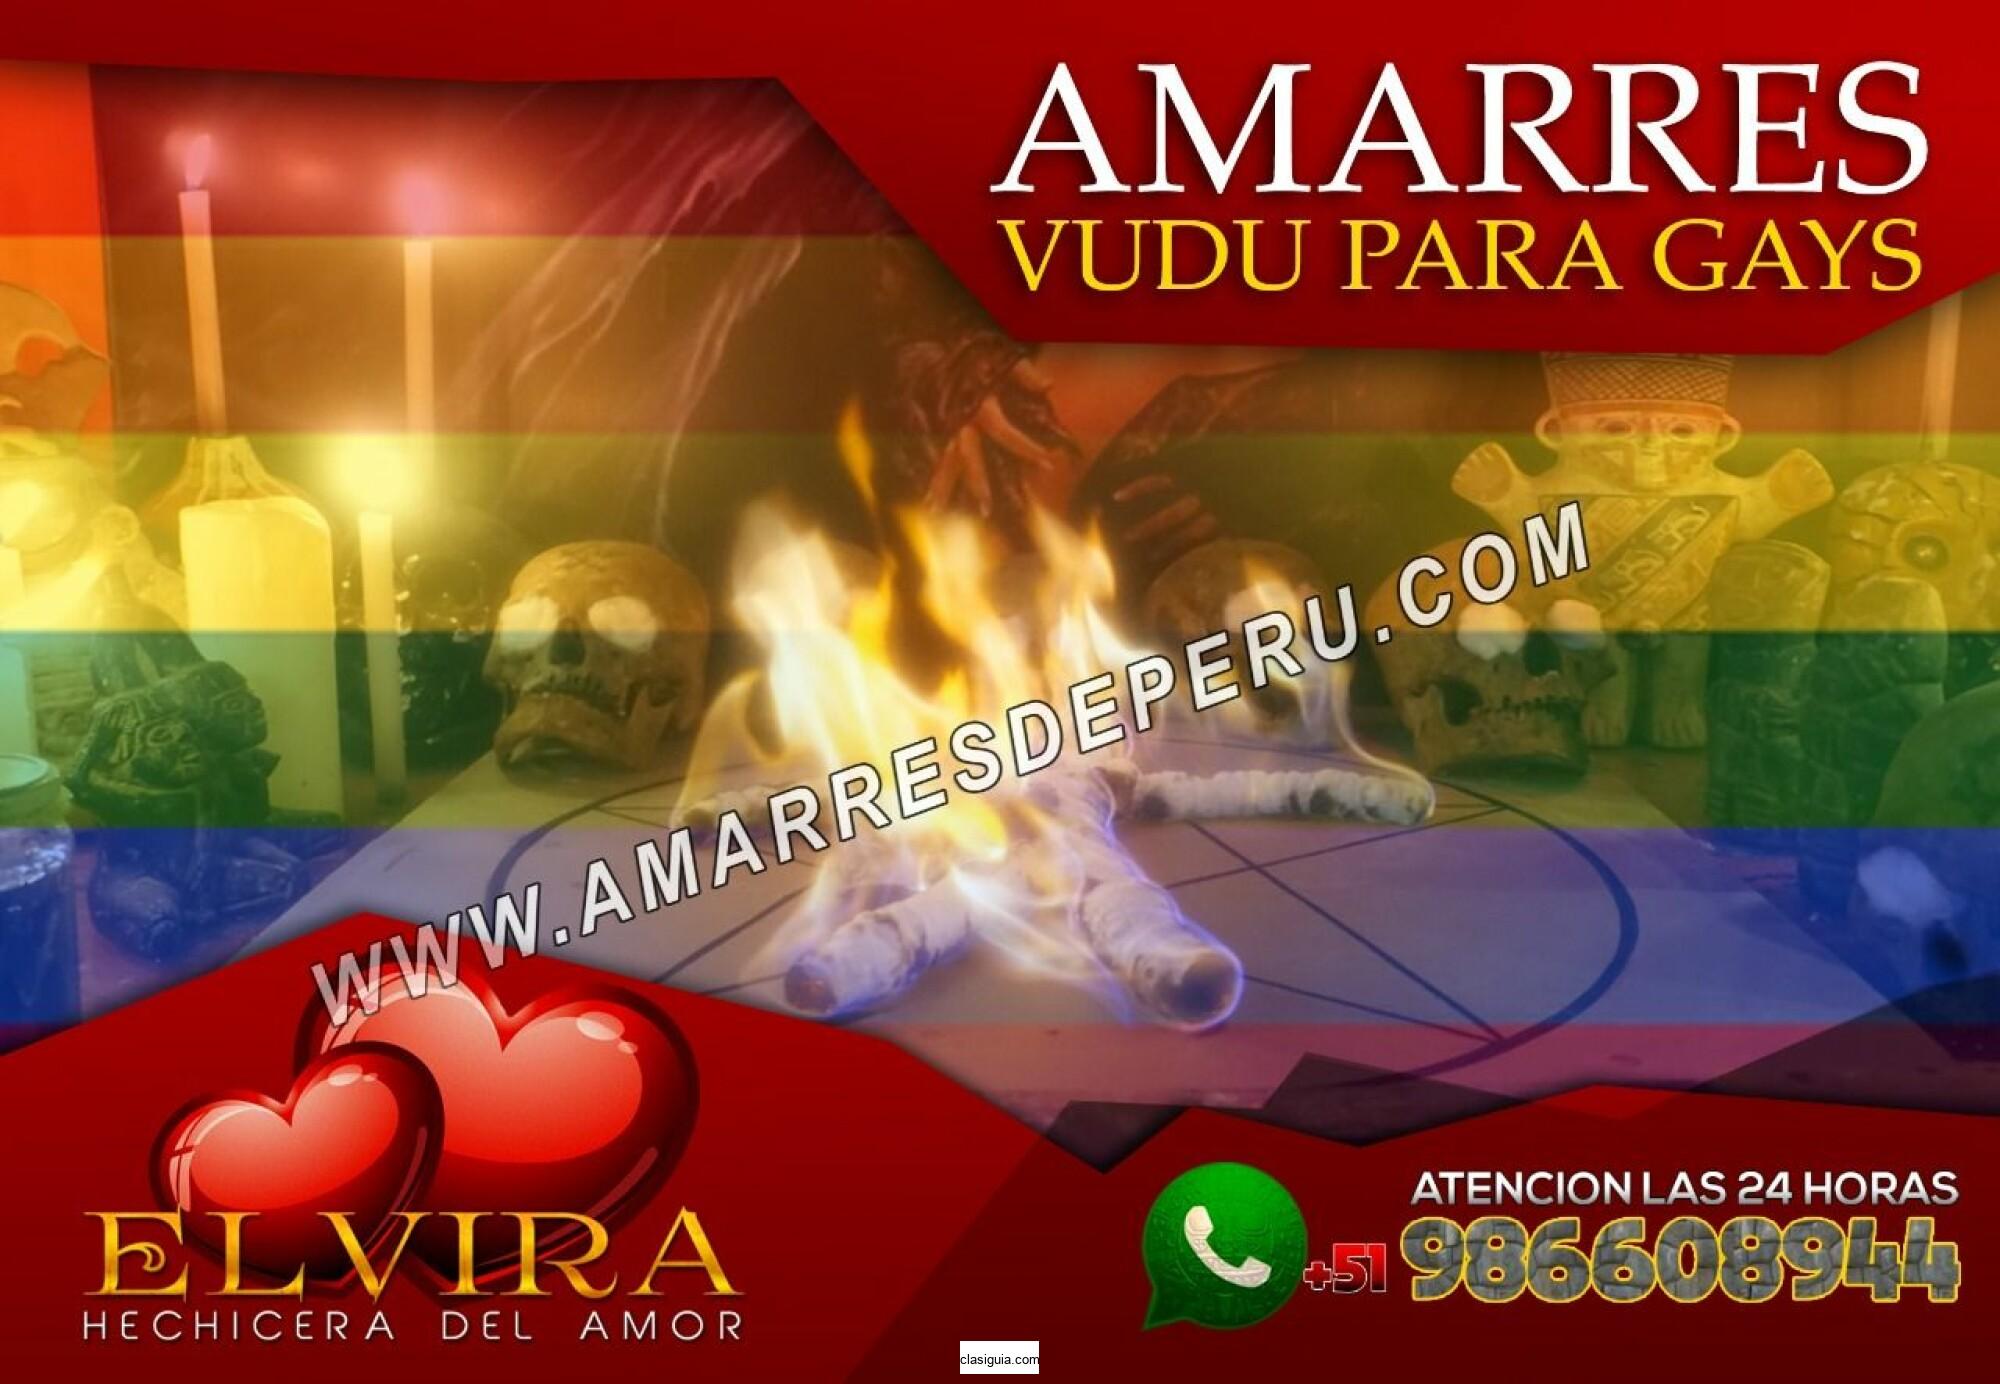 AMARRES DE AMOR CON MAGIA NEGRA HECHICERA ELVIRA